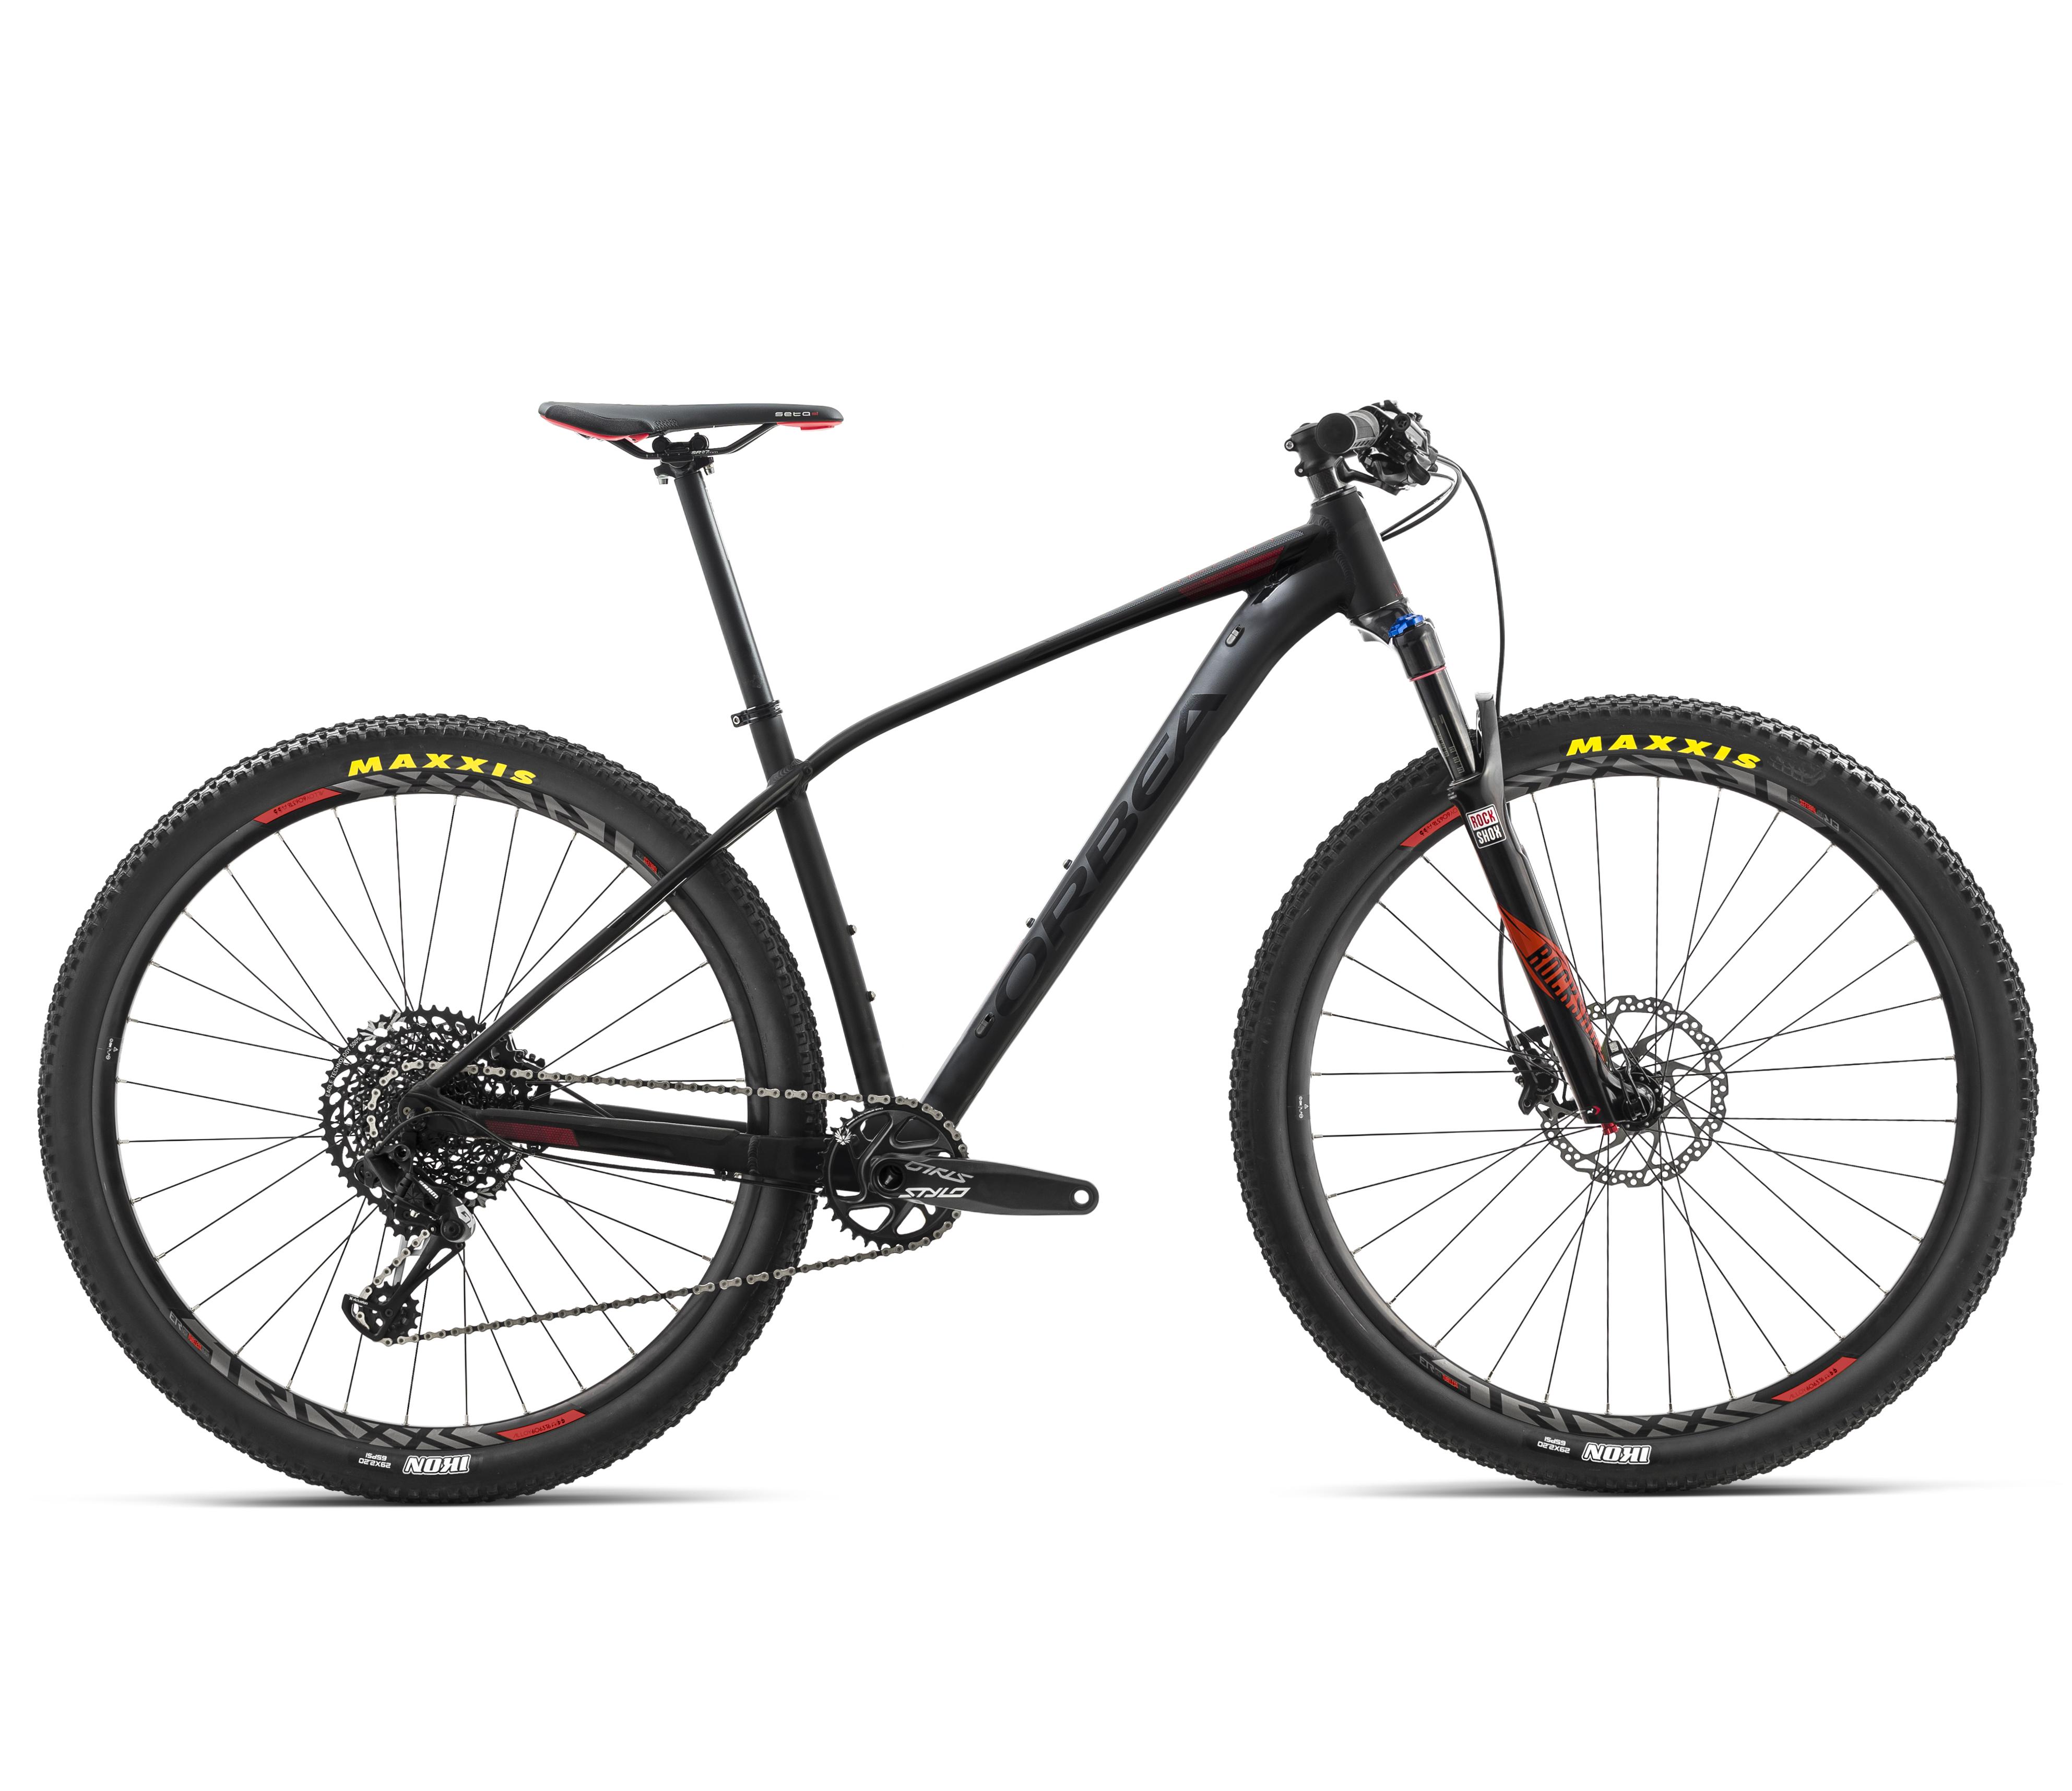 Orbea Versand | Orbea Mountainbike Alma H10 | Schwarz | online kaufen